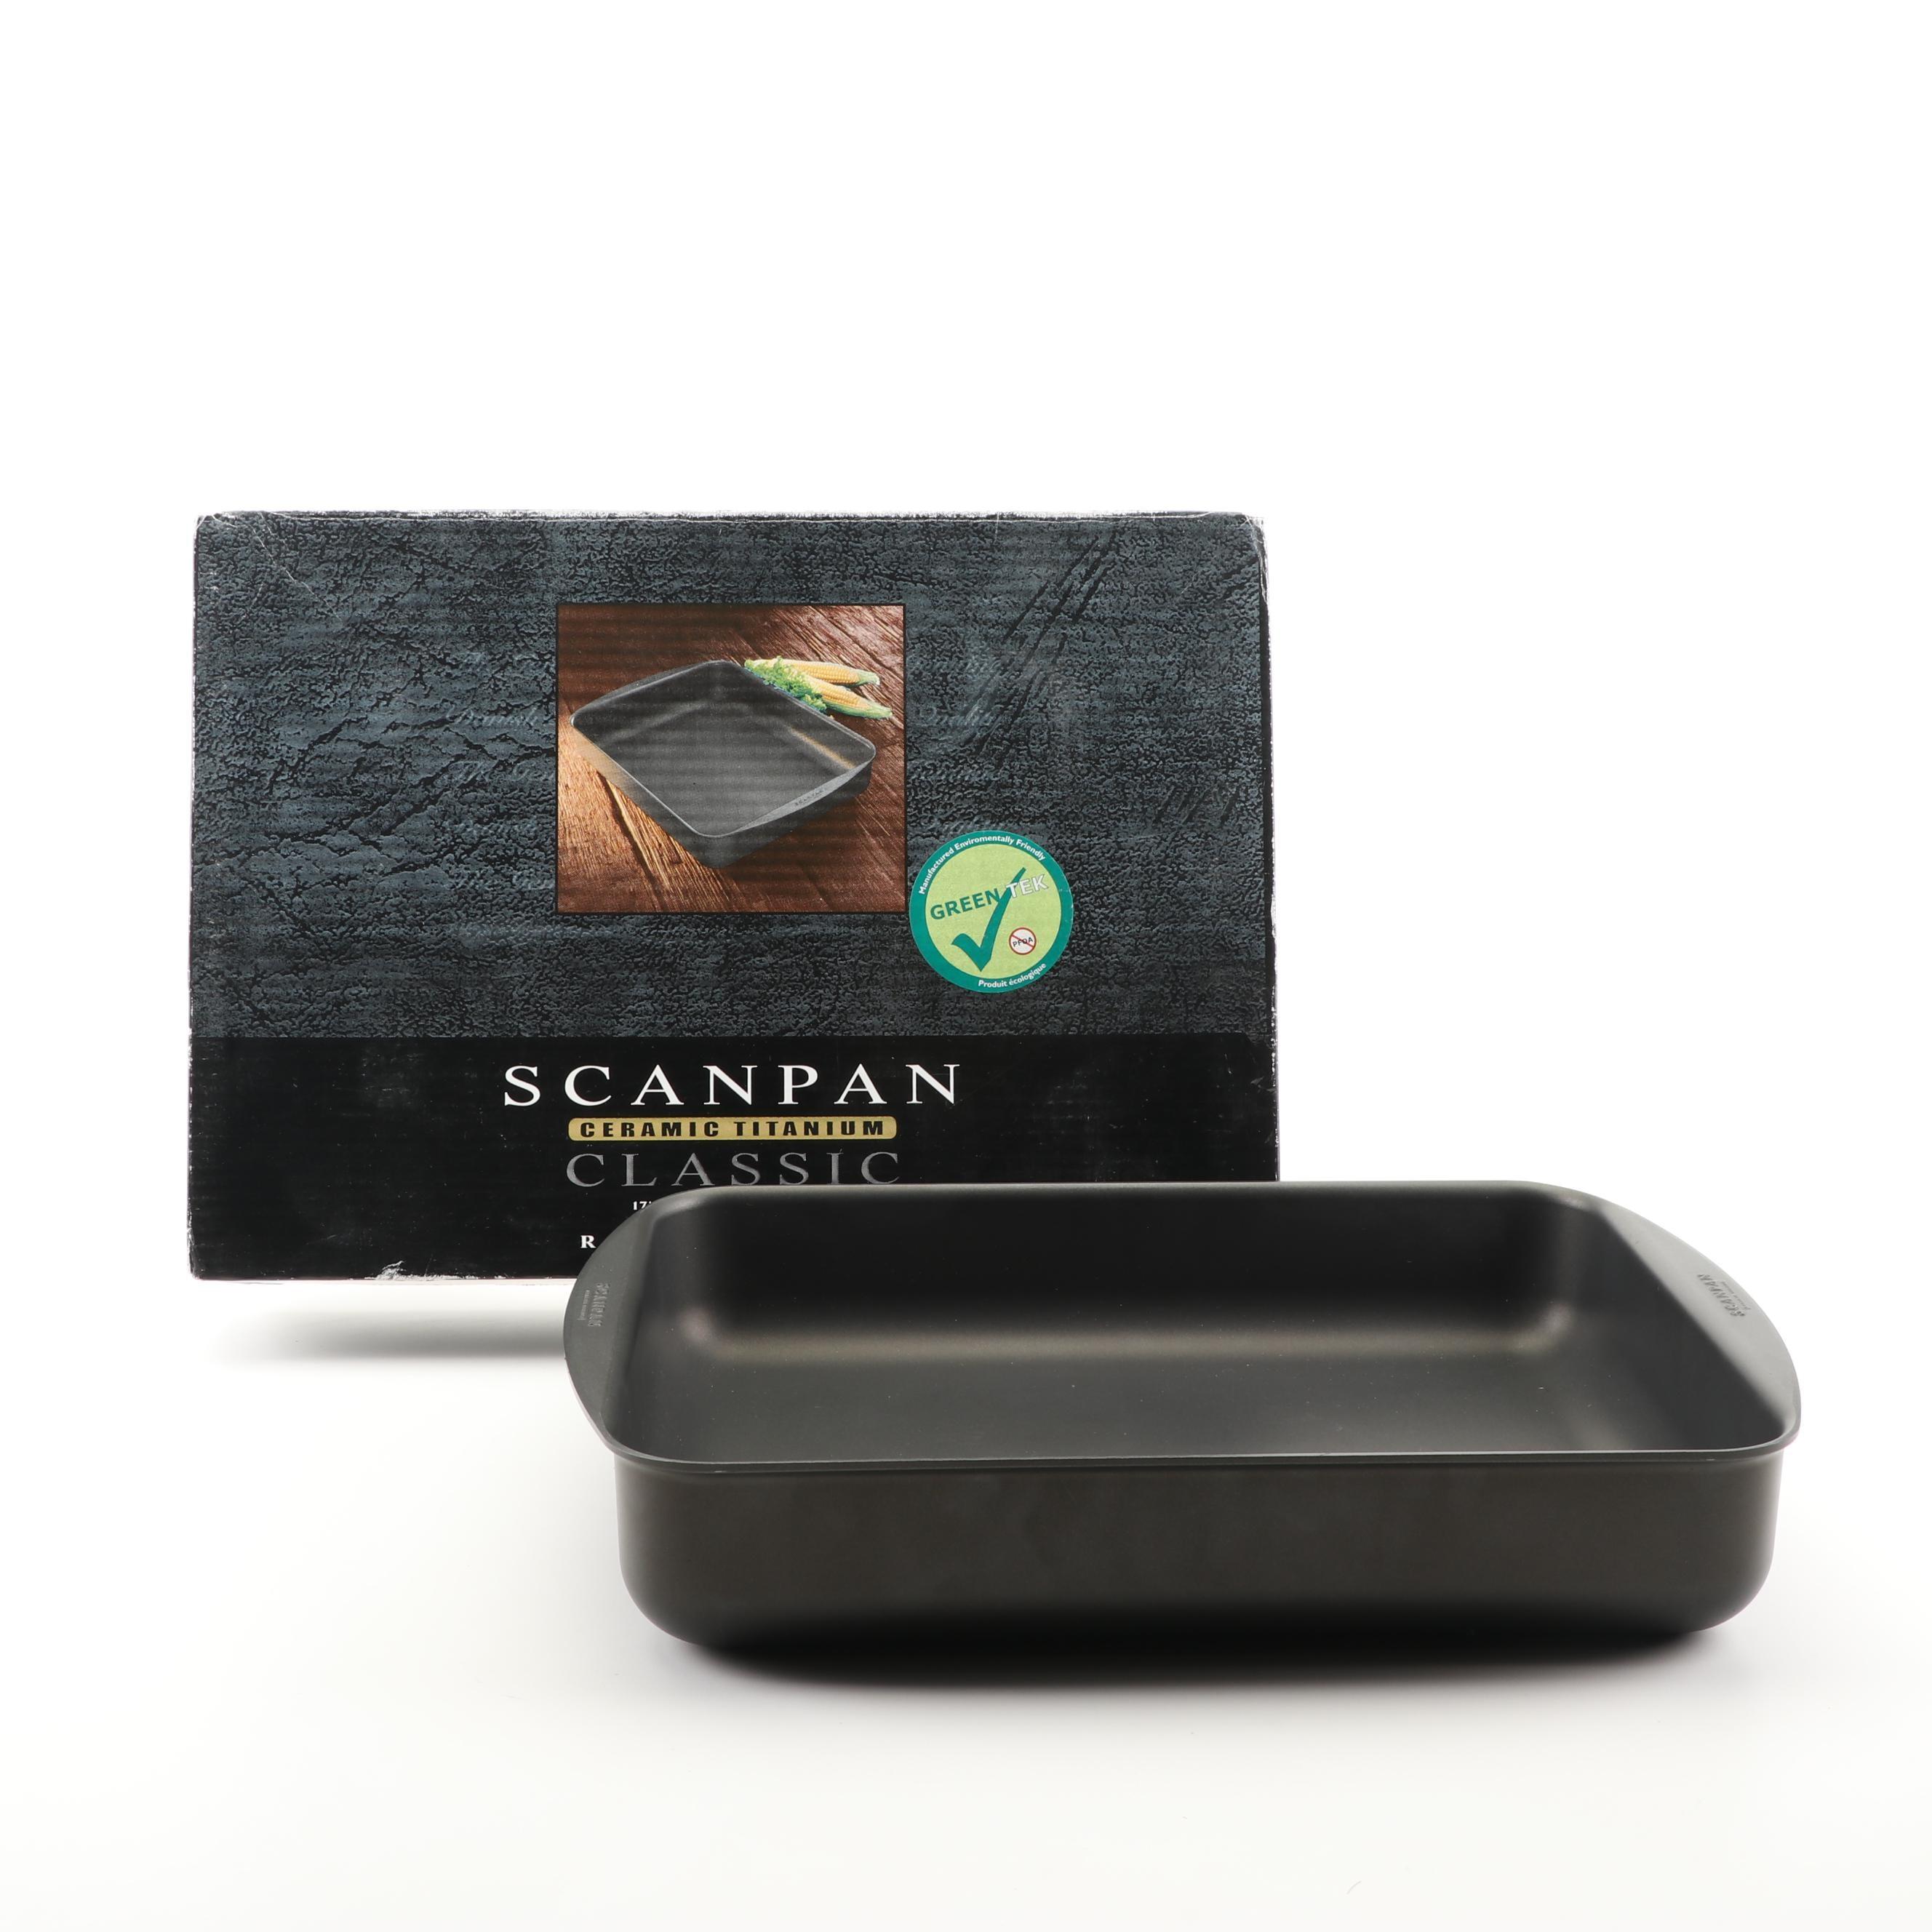 Scanpan Classic Roasting Pan